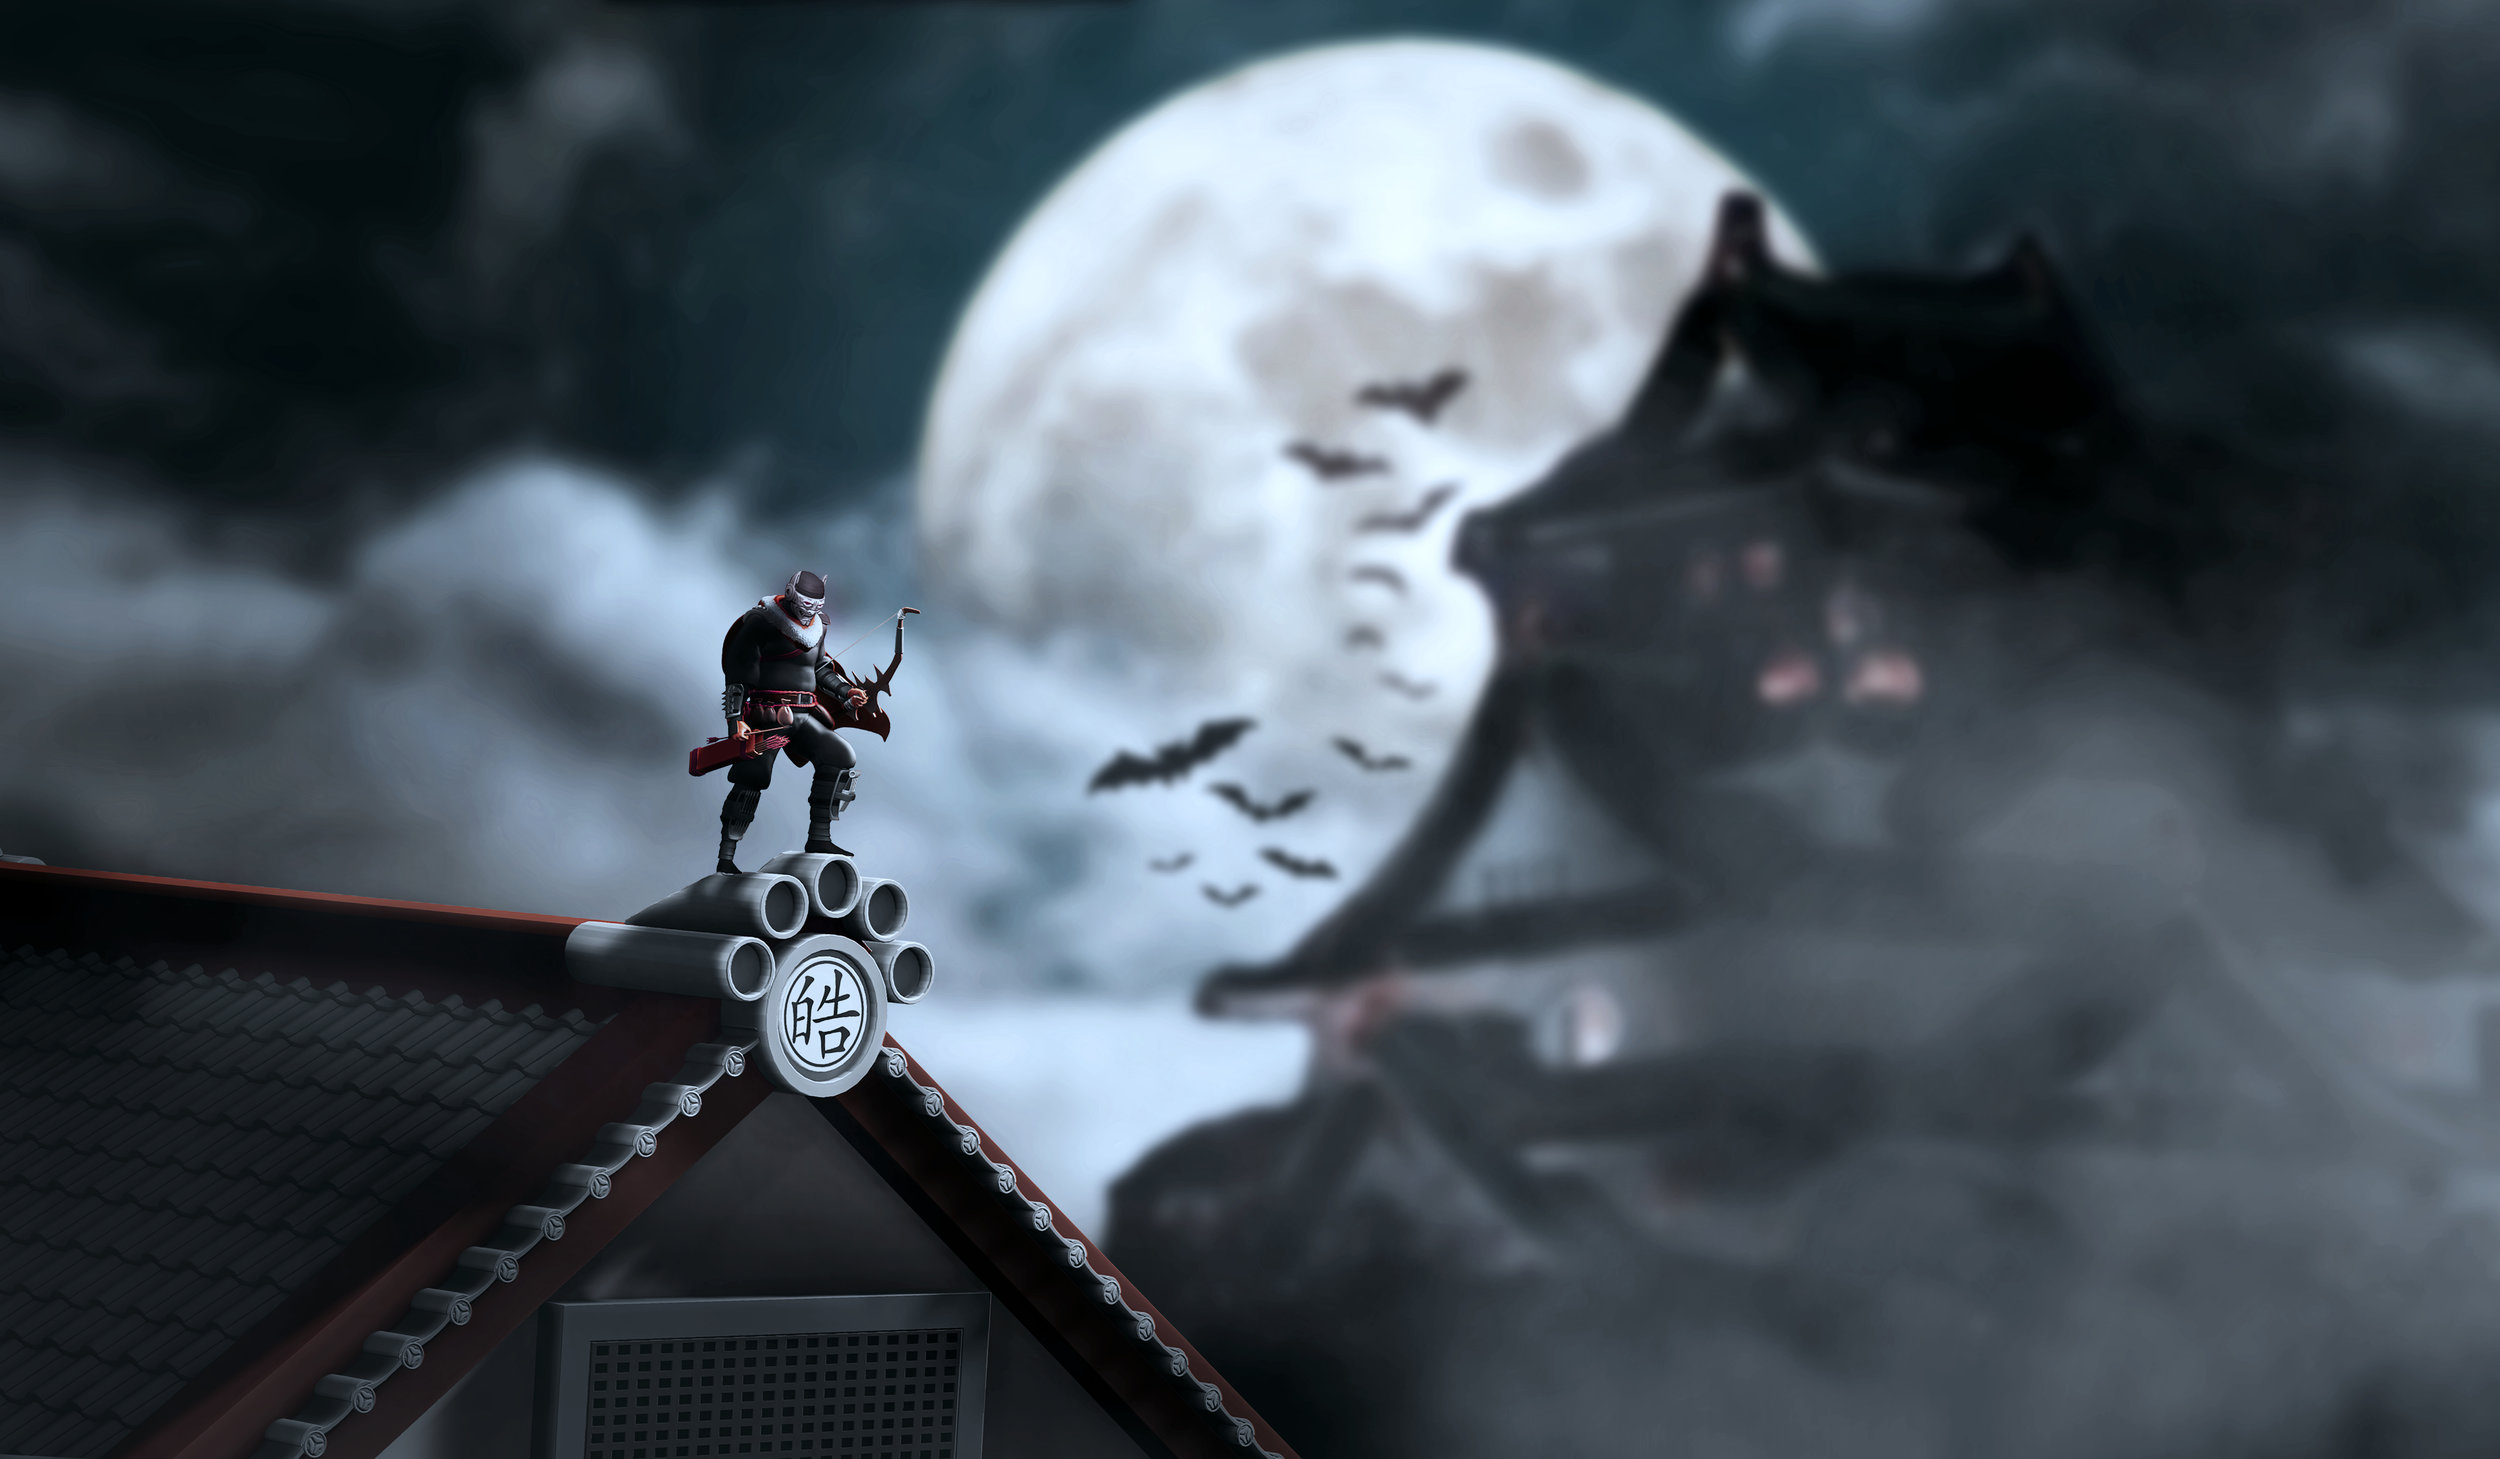 ninjabatman merged 3.0.jpg